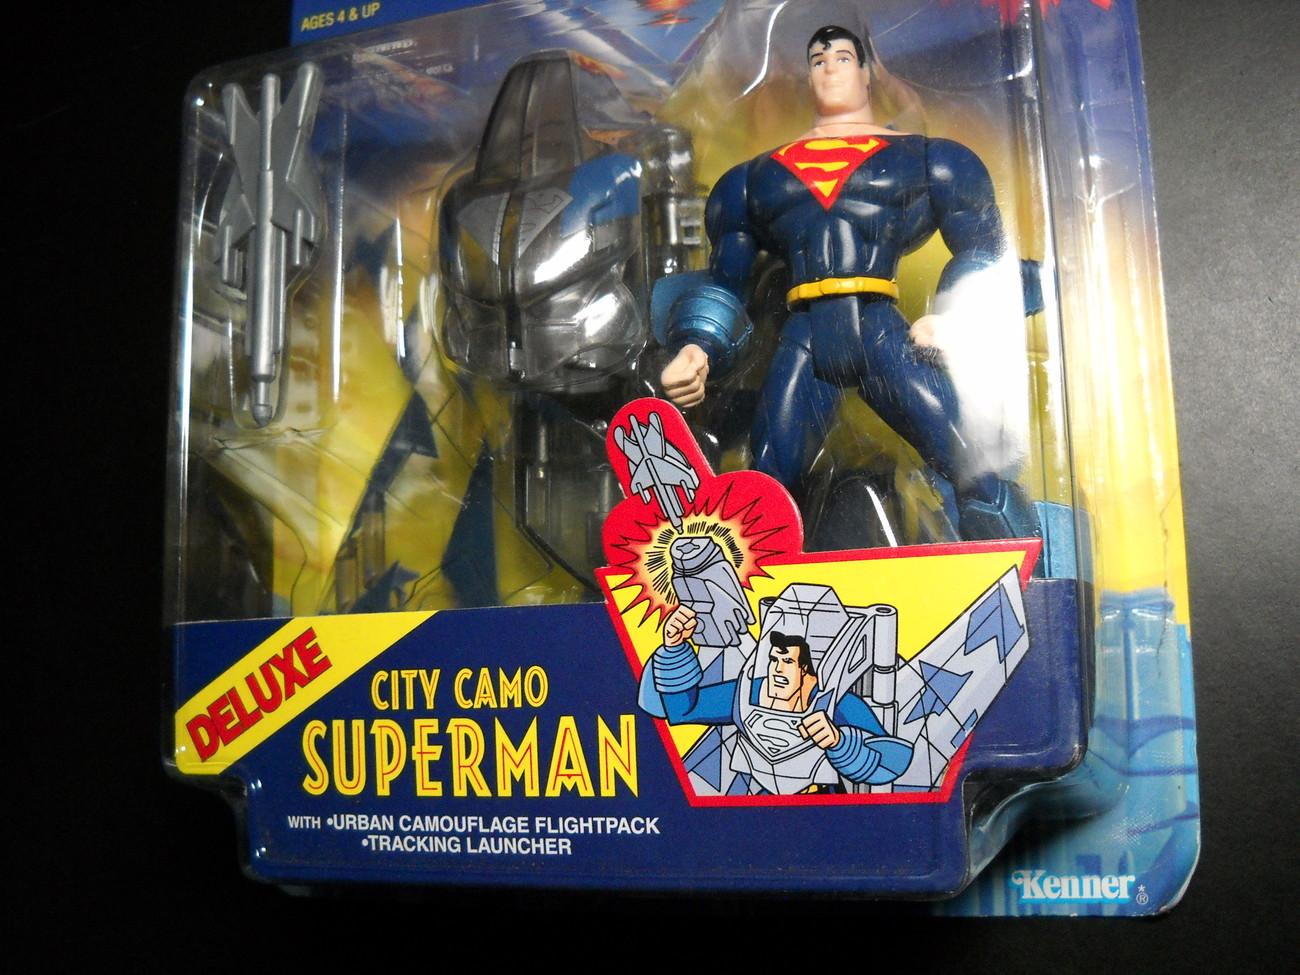 Kenner Hasbro Superman Animated Show City Camo 1996 Still Sealed Kenner Hasbro